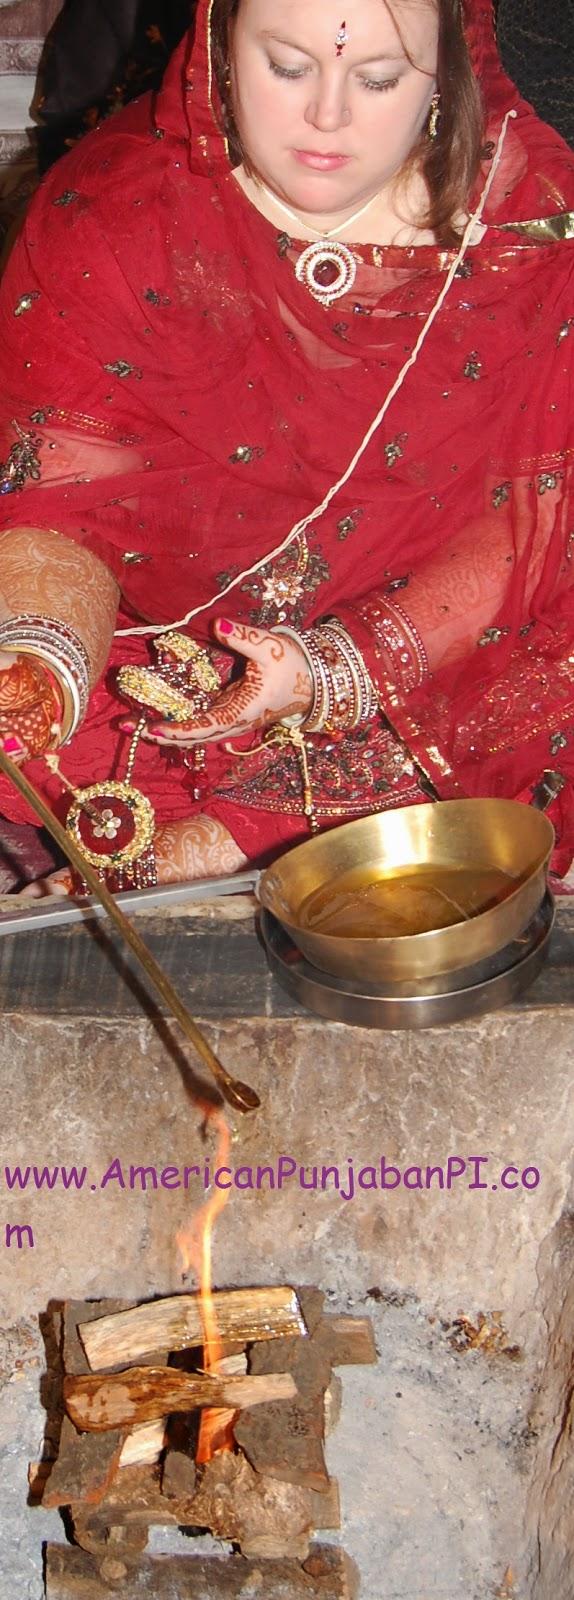 gori punjabi wedding relationship intercultural